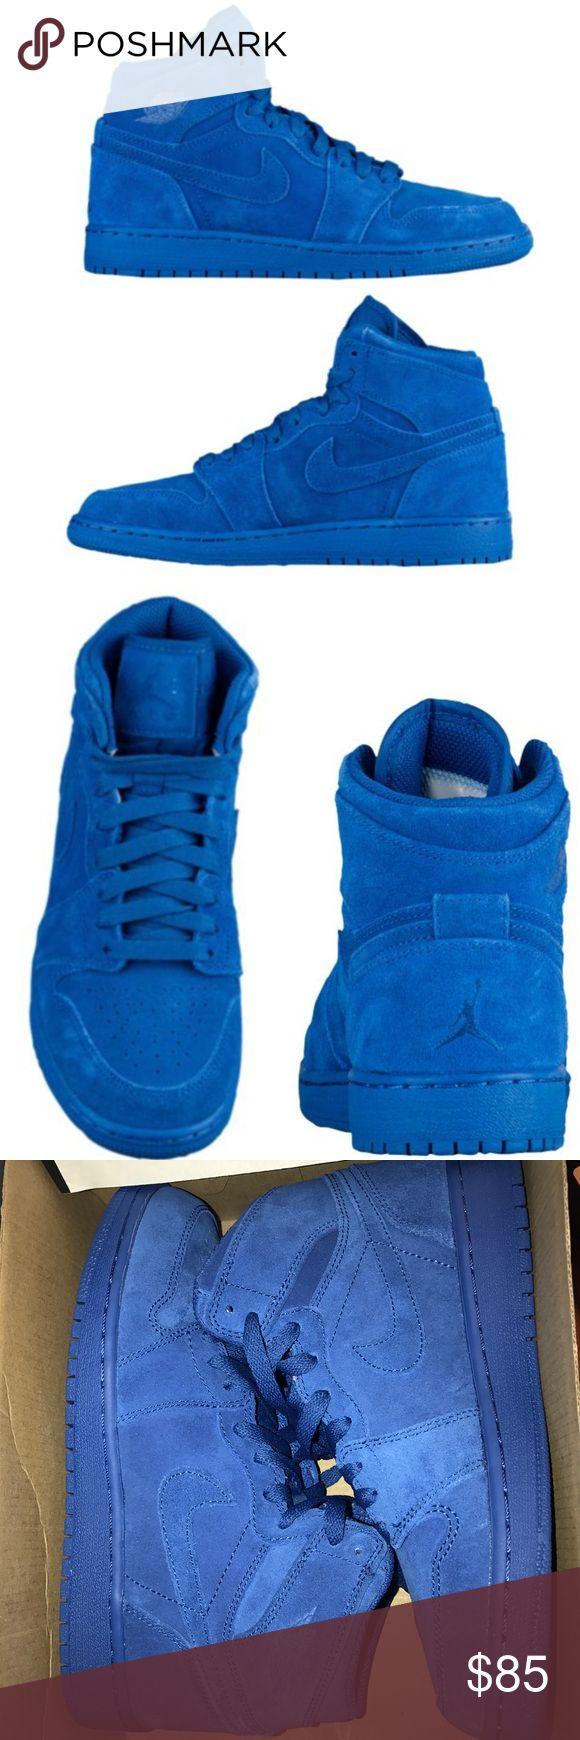 Air Jordan Retro 1 Suede Blue / Fits a Women's 7.5 Nike Shoes Sneakers